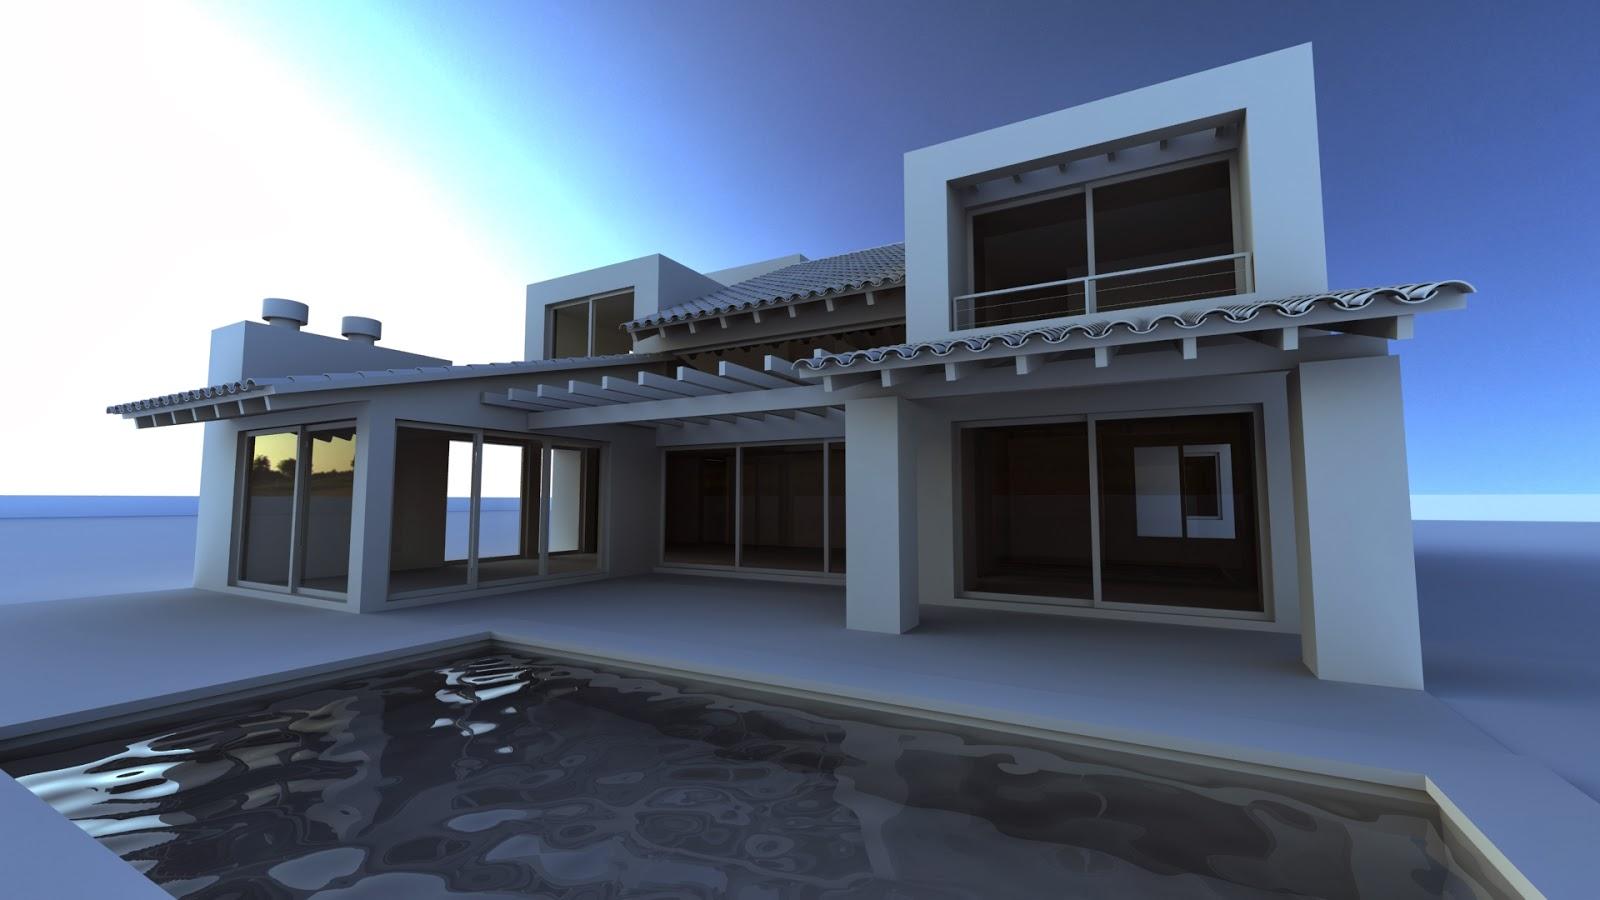 Infograf a y dise o 3d casa ckn - Diseno casa 3d ...